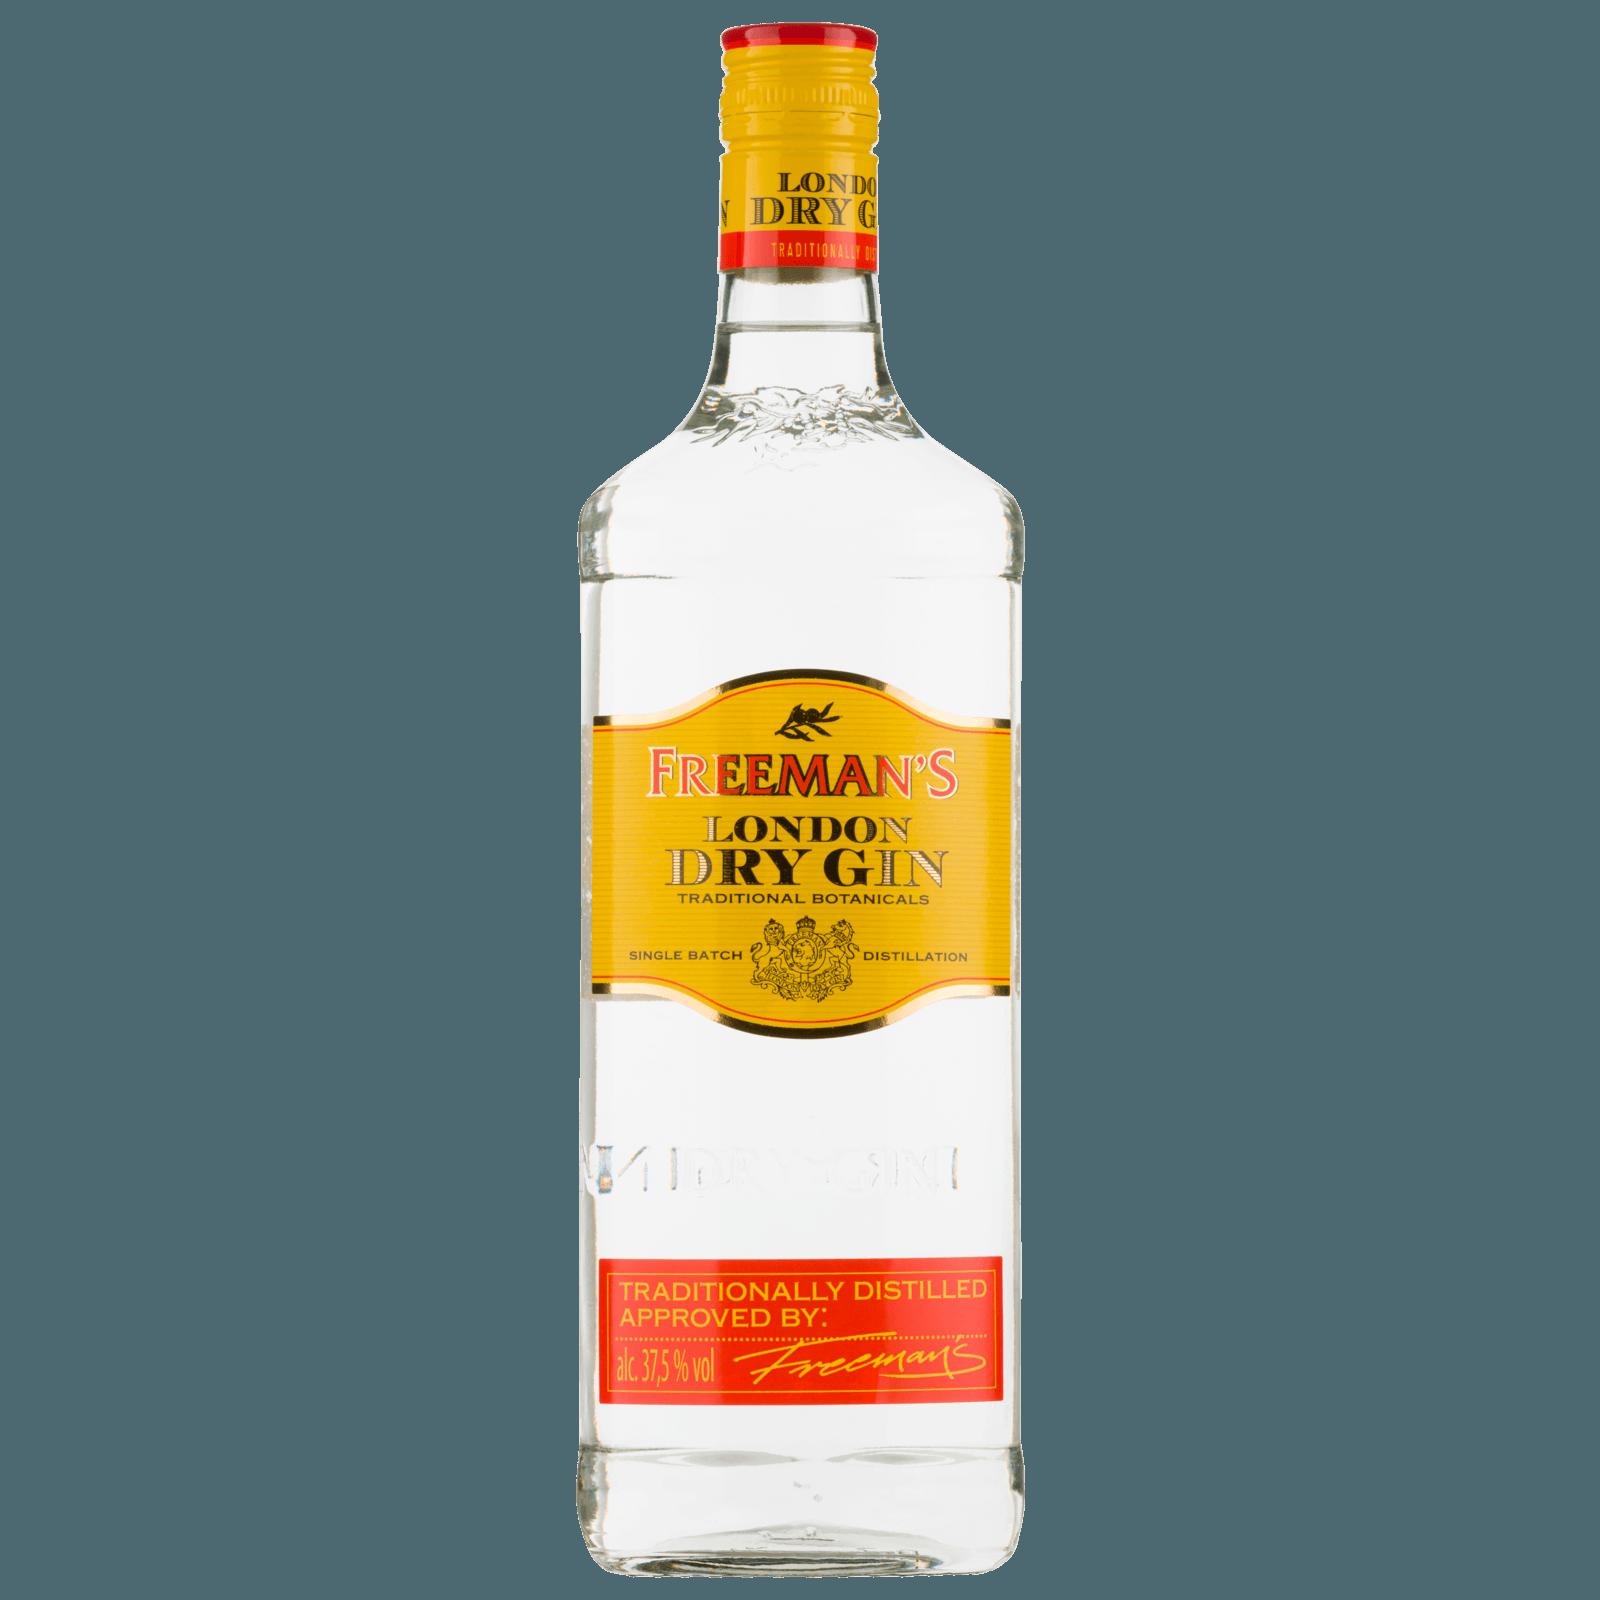 Freeman\'s London Dry Gin 0,7l bei REWE online bestellen!